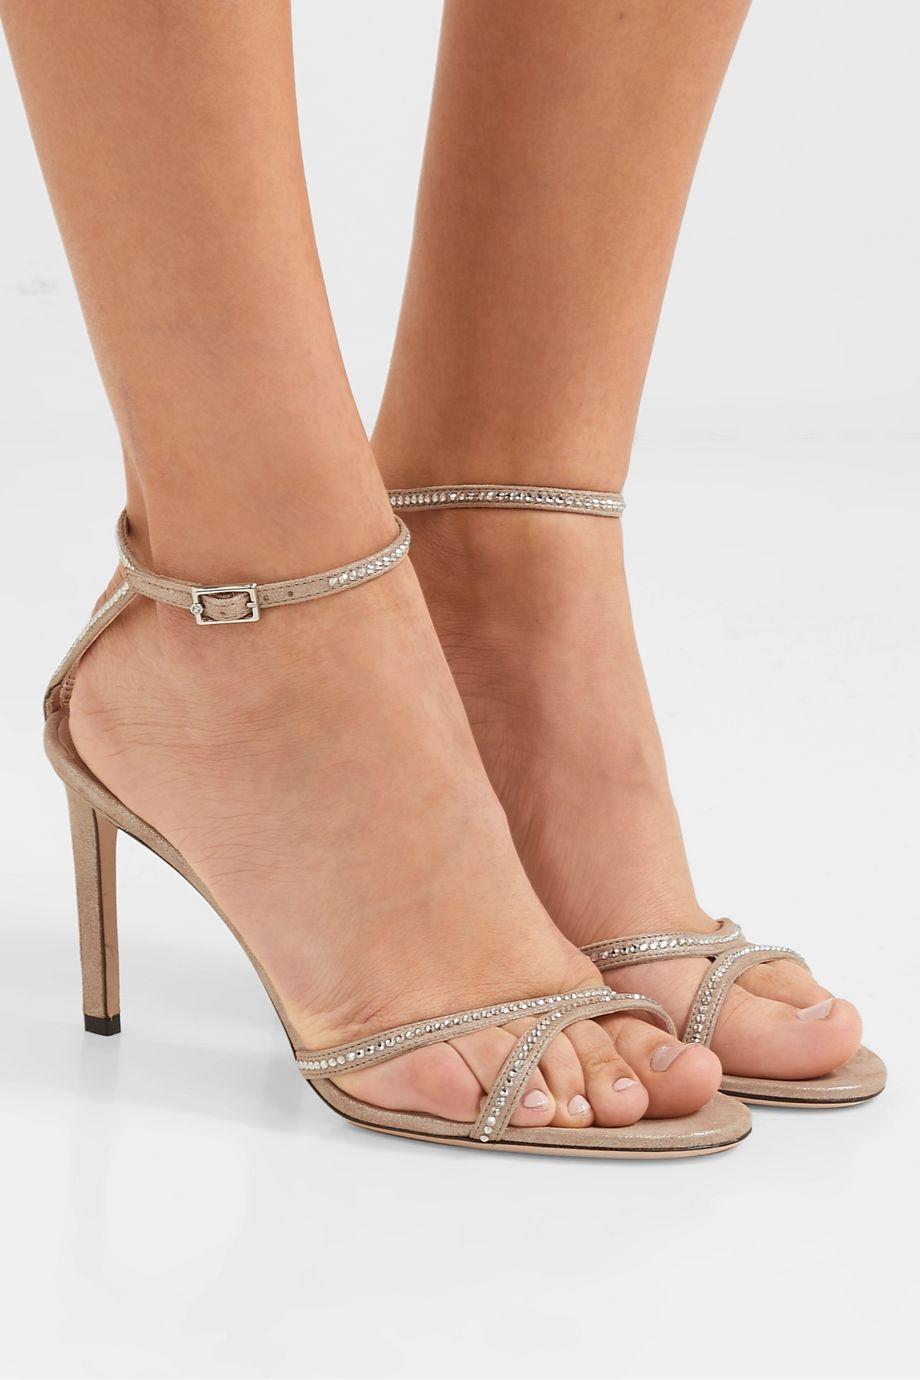 Jimmy Choo Lydia 85 crystal-embellished metallic suede sandals